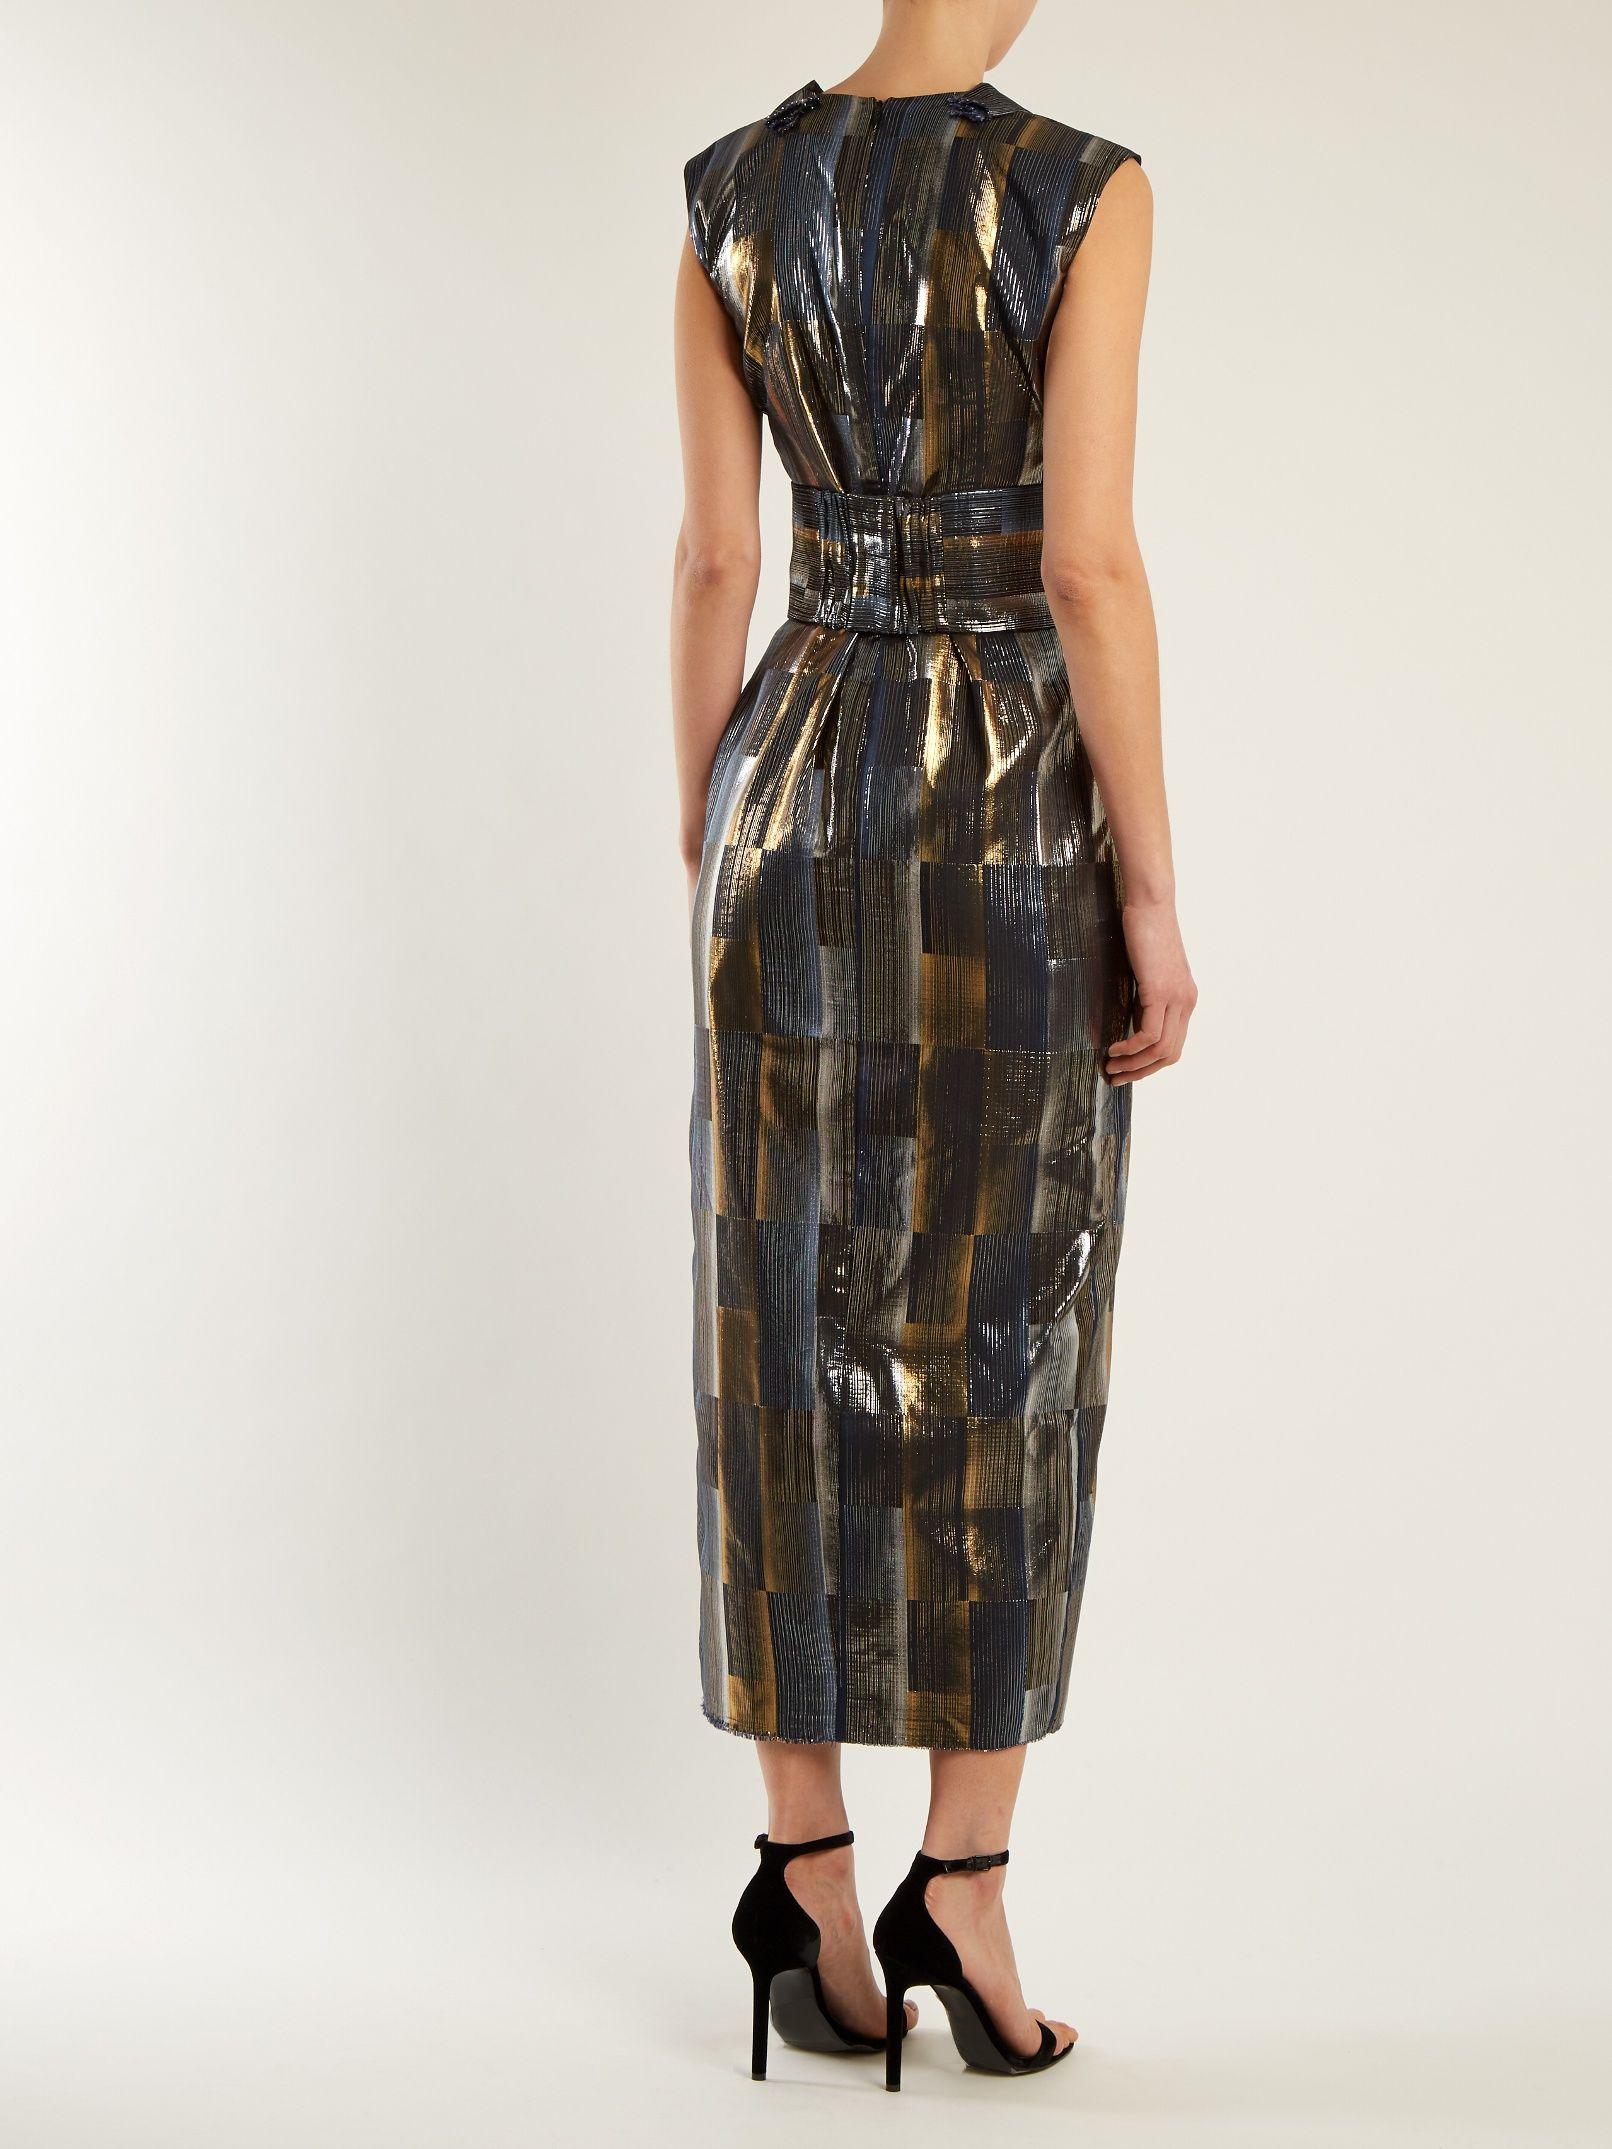 Aerosphere sleeveless jacquard dress Carl Kapp Manchester Great Sale Sale Online TZCIxh